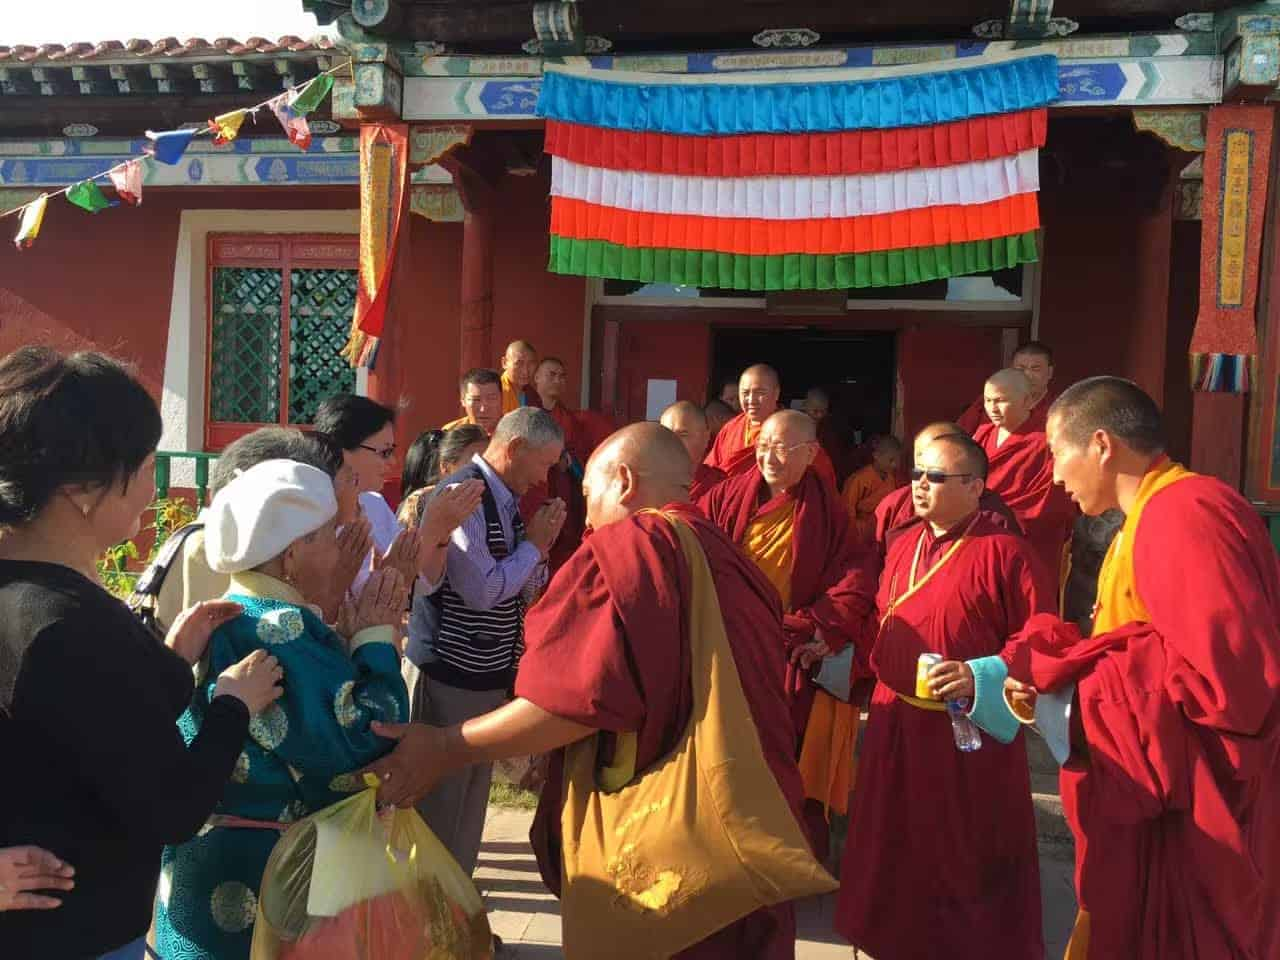 gosok-rinpoche-mongolia-2016-ffbdb8ad963ebb82cb717a58a0a09de